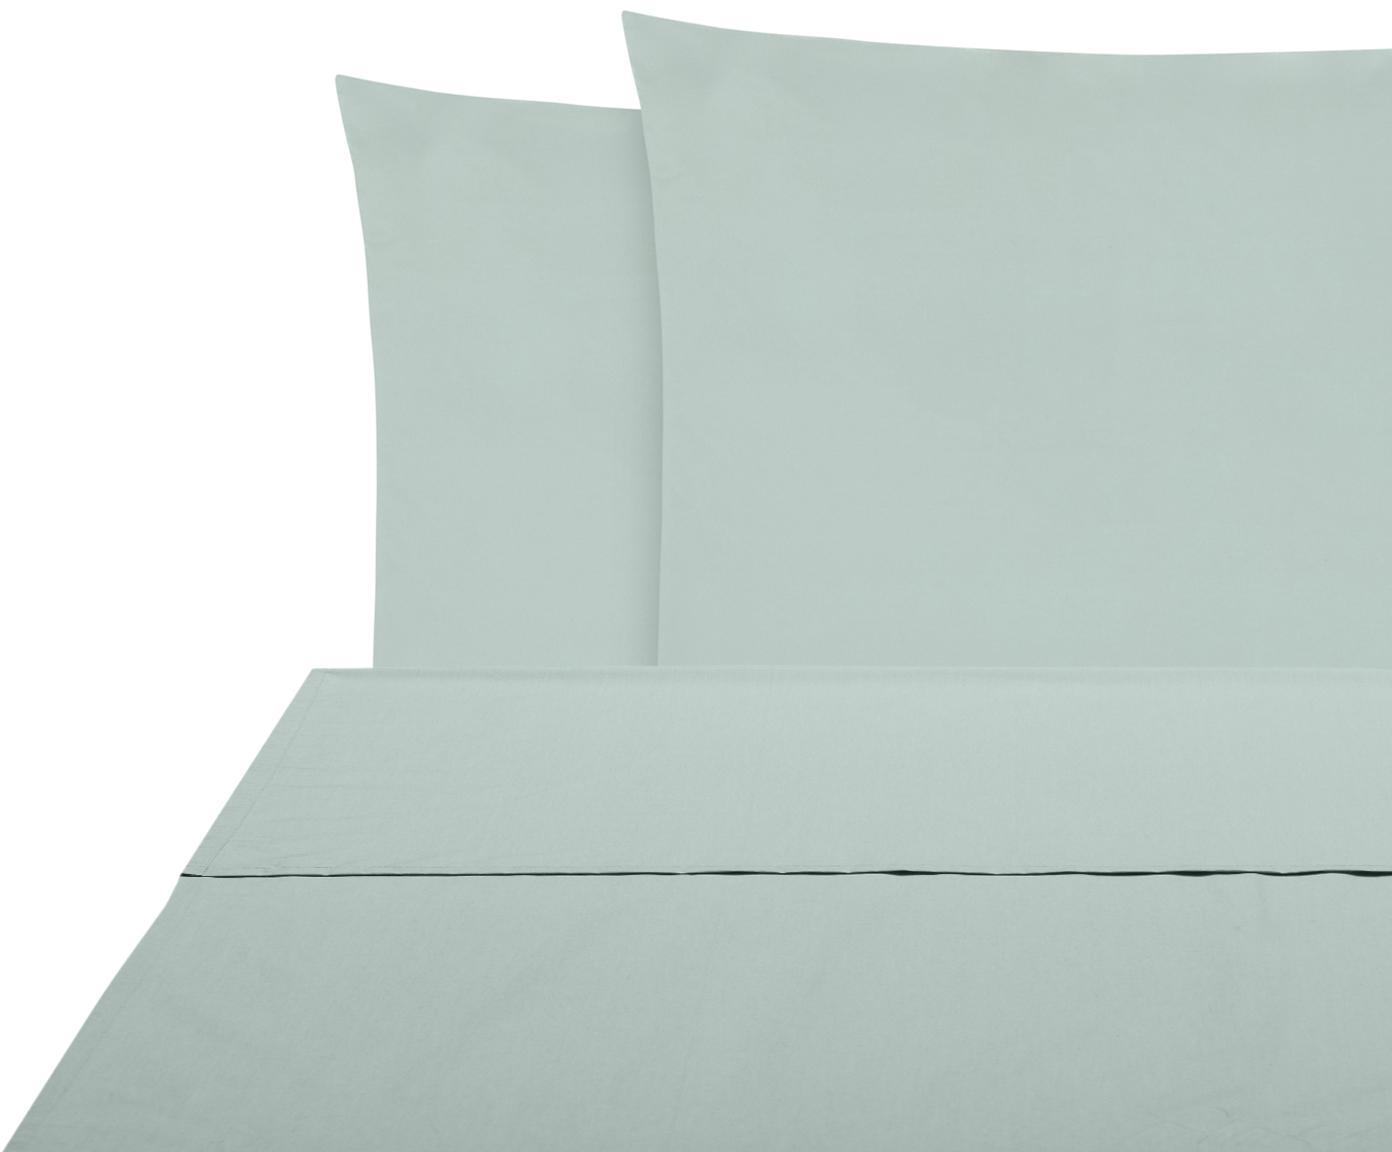 Set lenzuola in percalle Elsie 2 pz, Tessuto: percalle Densità del filo, Verde salvia, 240 x 300 cm